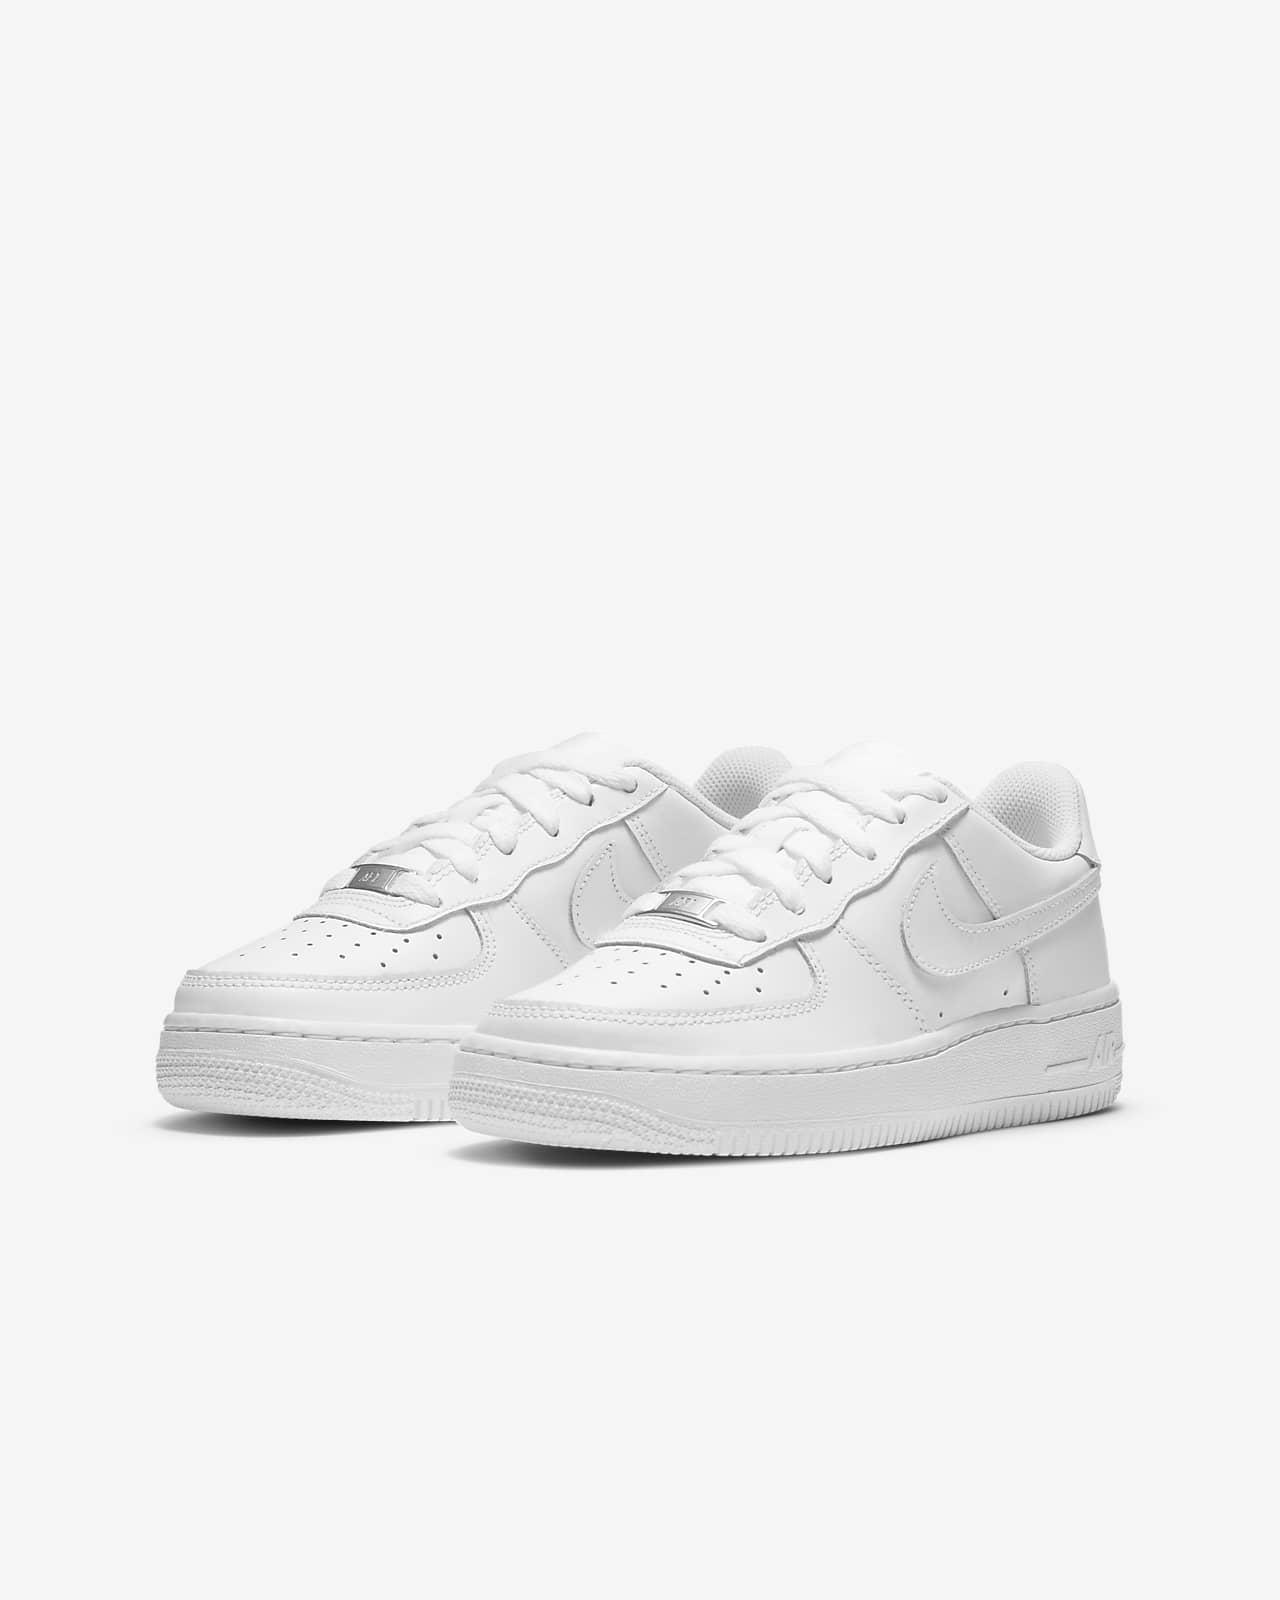 Nike Air Force 1 Older Kids' Shoe. Nike RO